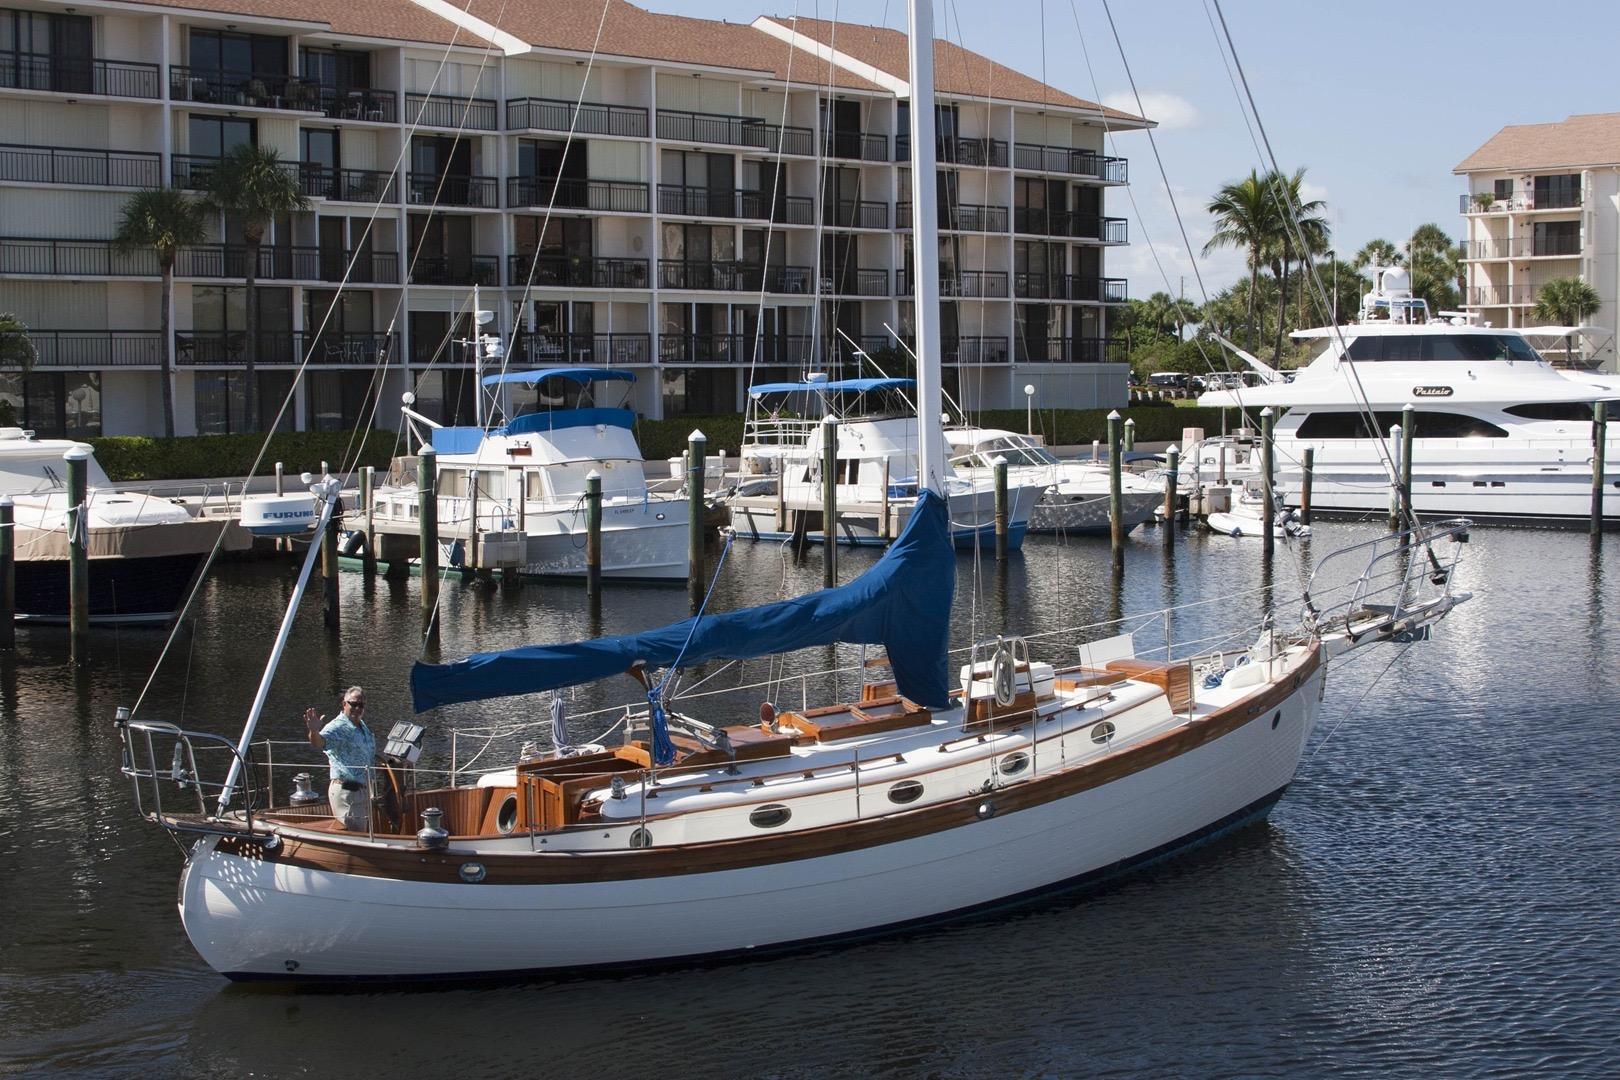 la barca christian personals La barca restaurant, new york city: see 3 unbiased reviews of la barca restaurant, rated 5 of 5 on tripadvisor and ranked #7,551 of 14,609 restaurants in new york city.